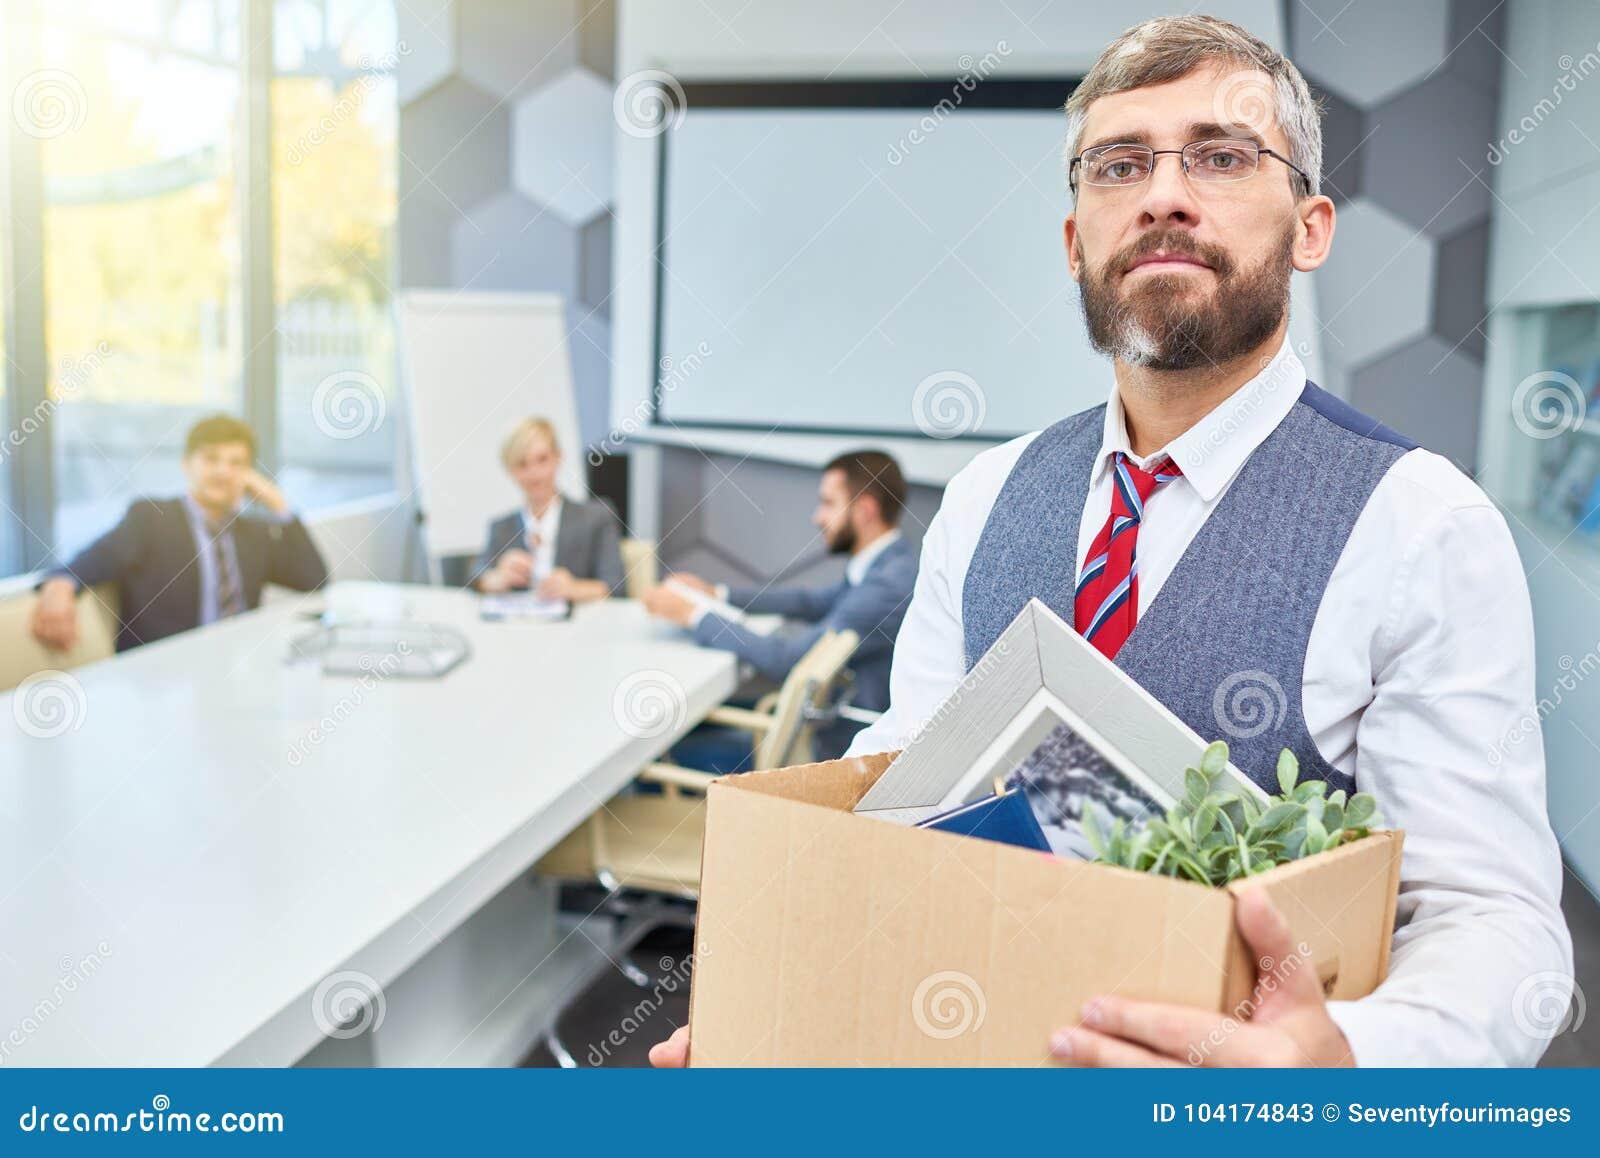 Mature Businessman Leaving his Job